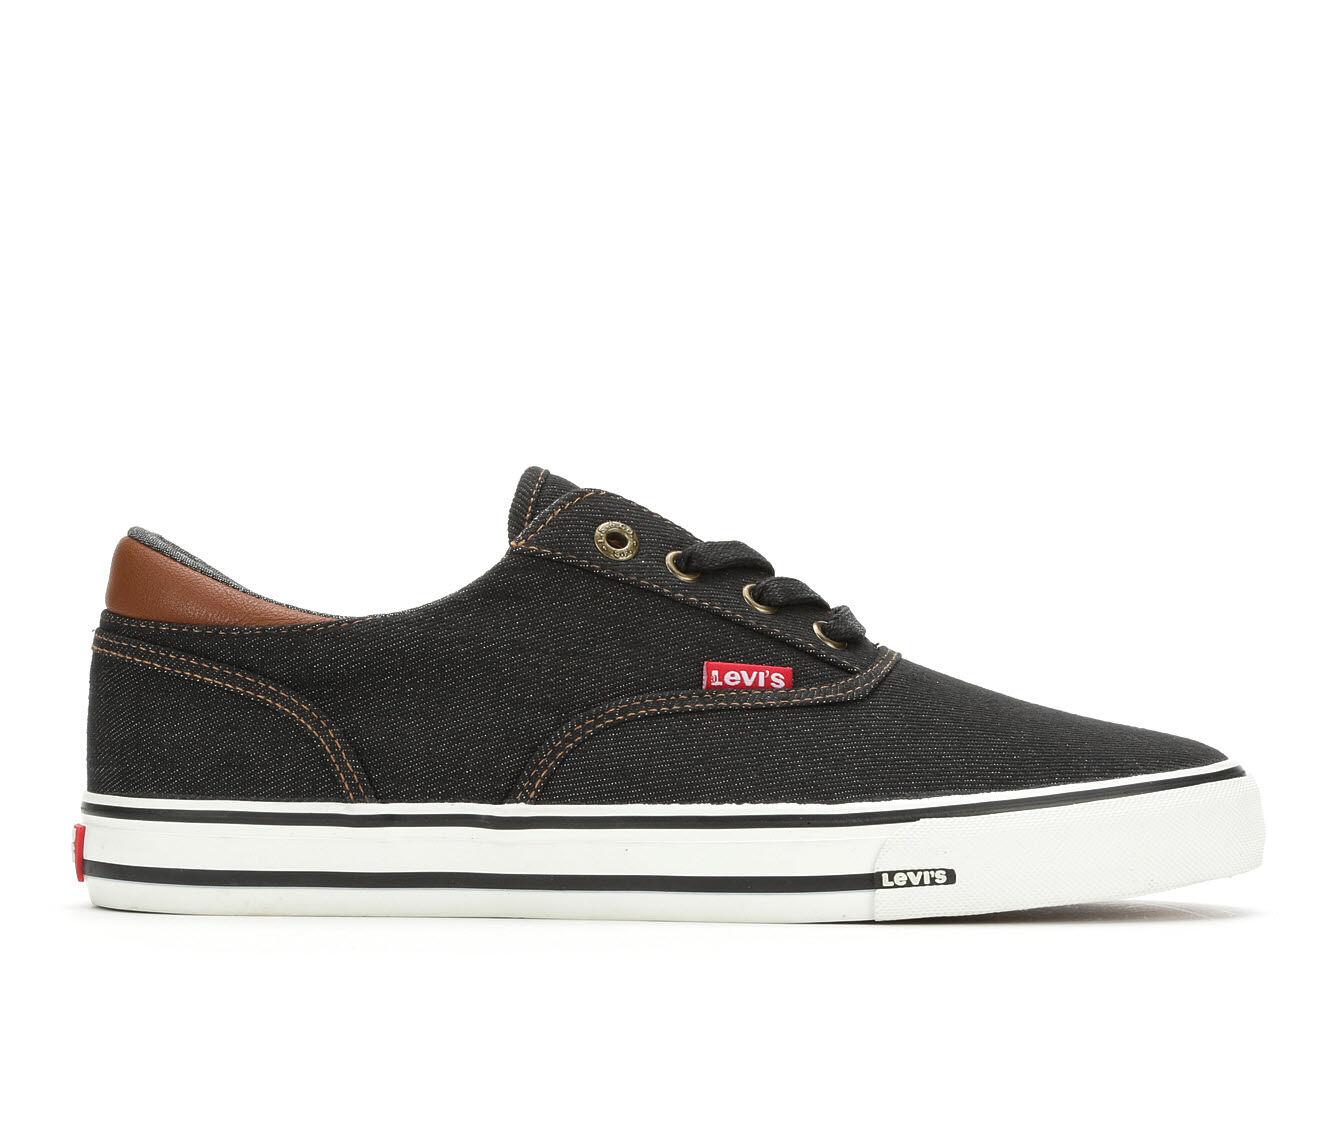 Men's Levis Ethan Denim ll Casual Shoes Black/Tan